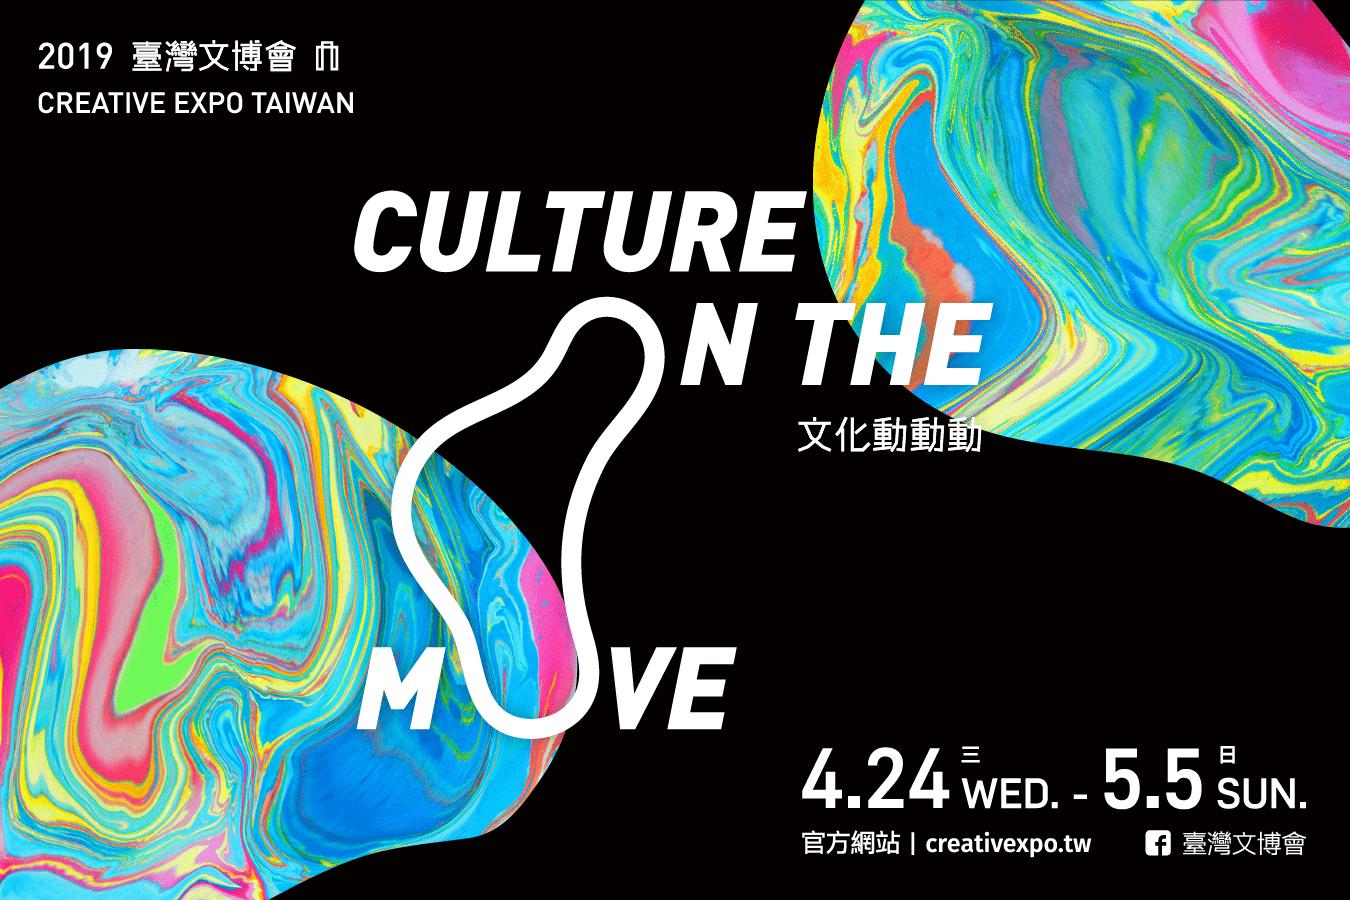 2019 Creative Expo Taiwan: Culture On the Move!